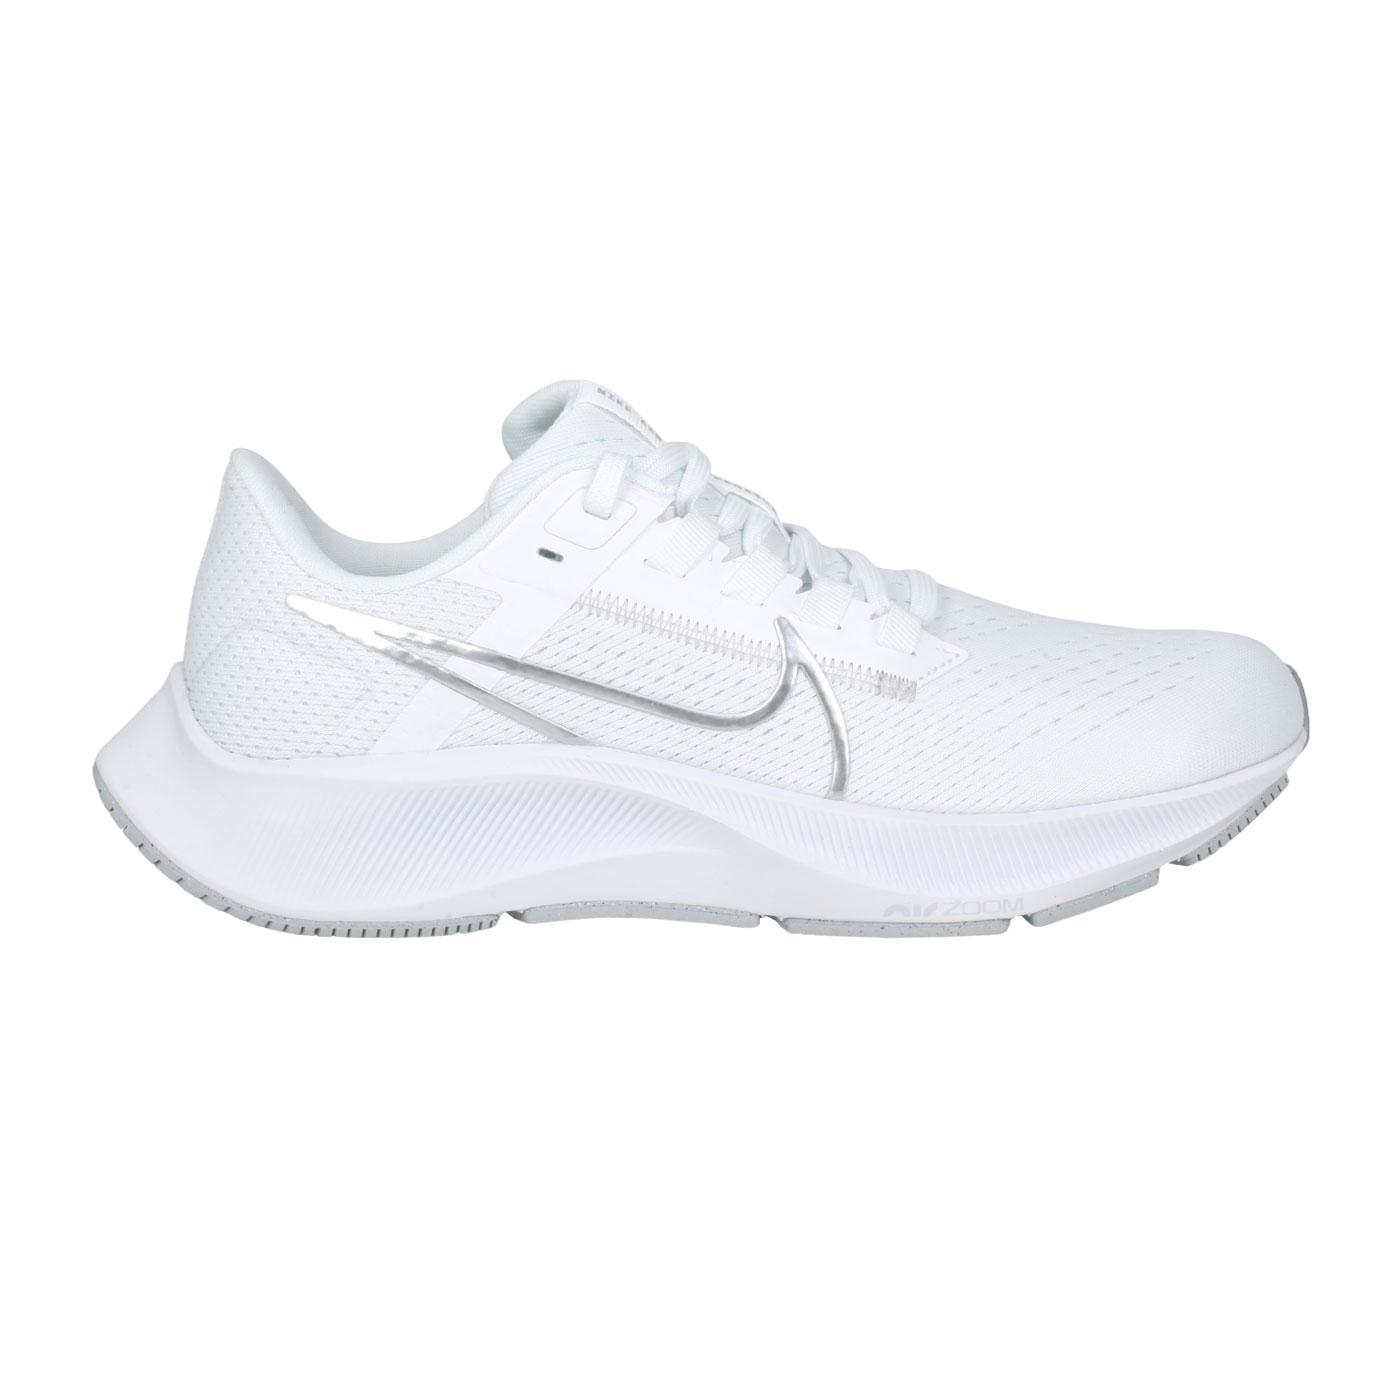 NIKE 女款慢跑鞋  @WMNS AIR ZOOM PEGASUS 38@CW7358-100 - 白銀